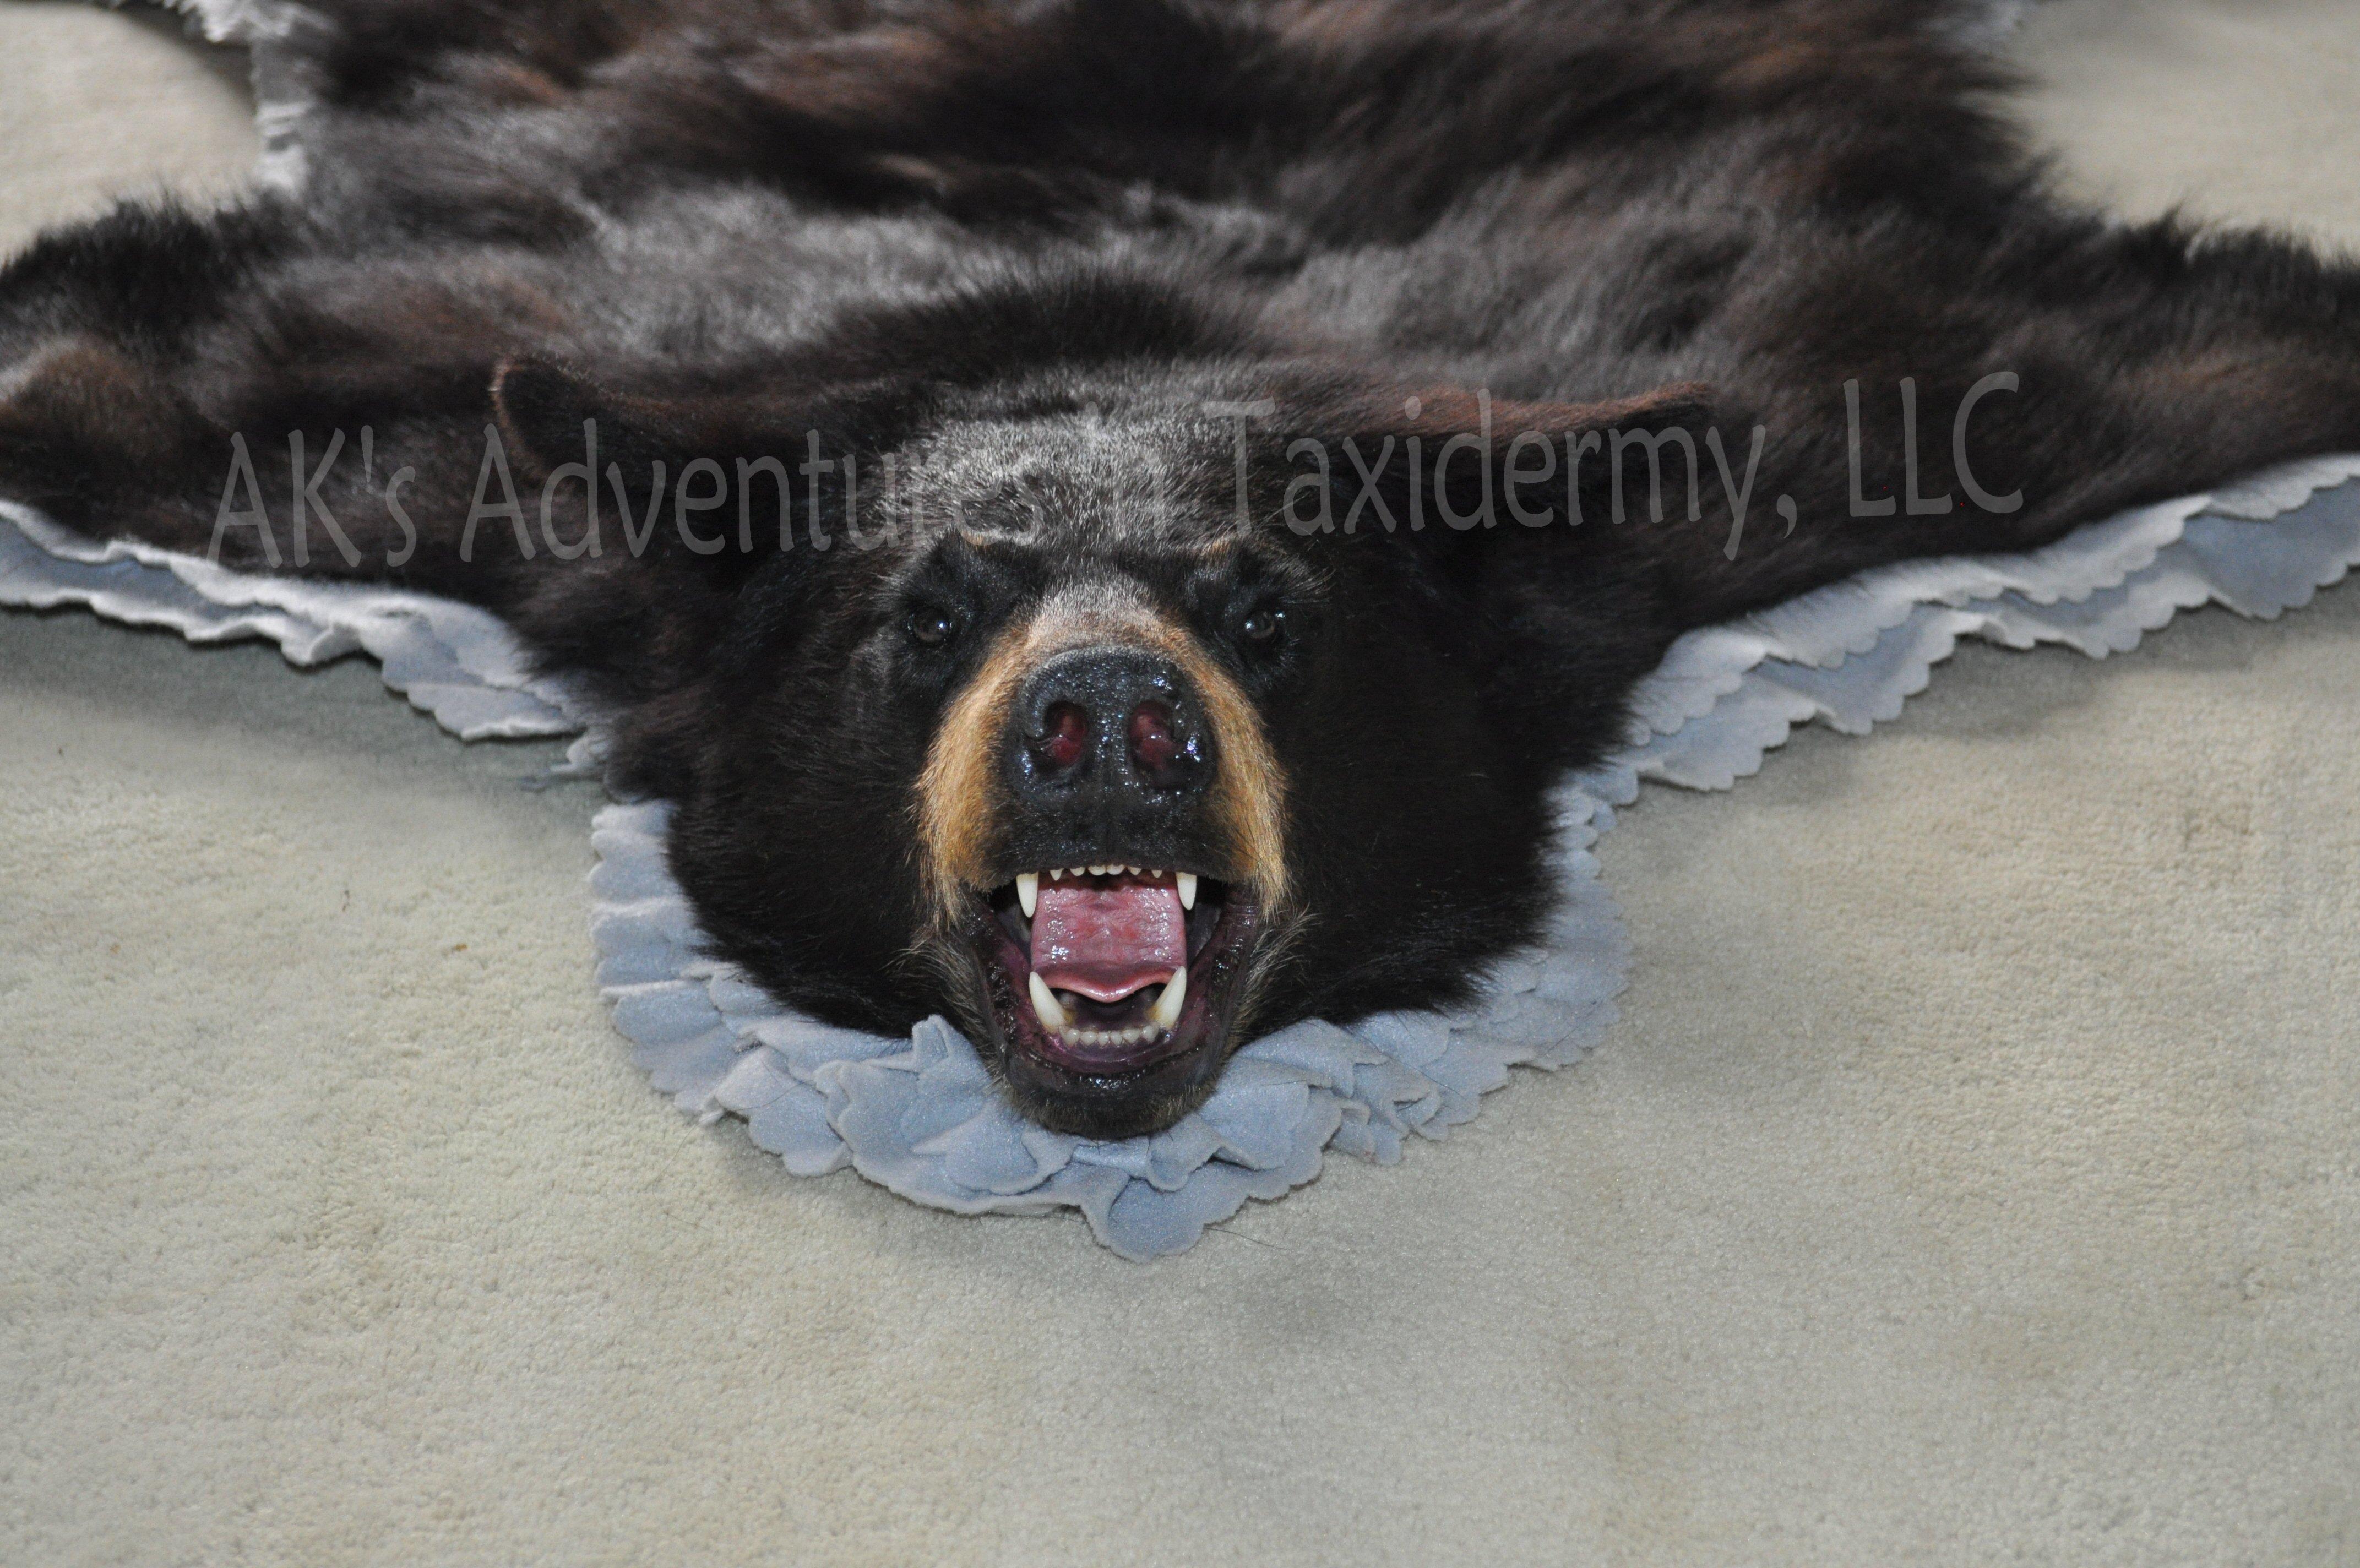 AK's Adventures in Taxidermy, LLC image 5